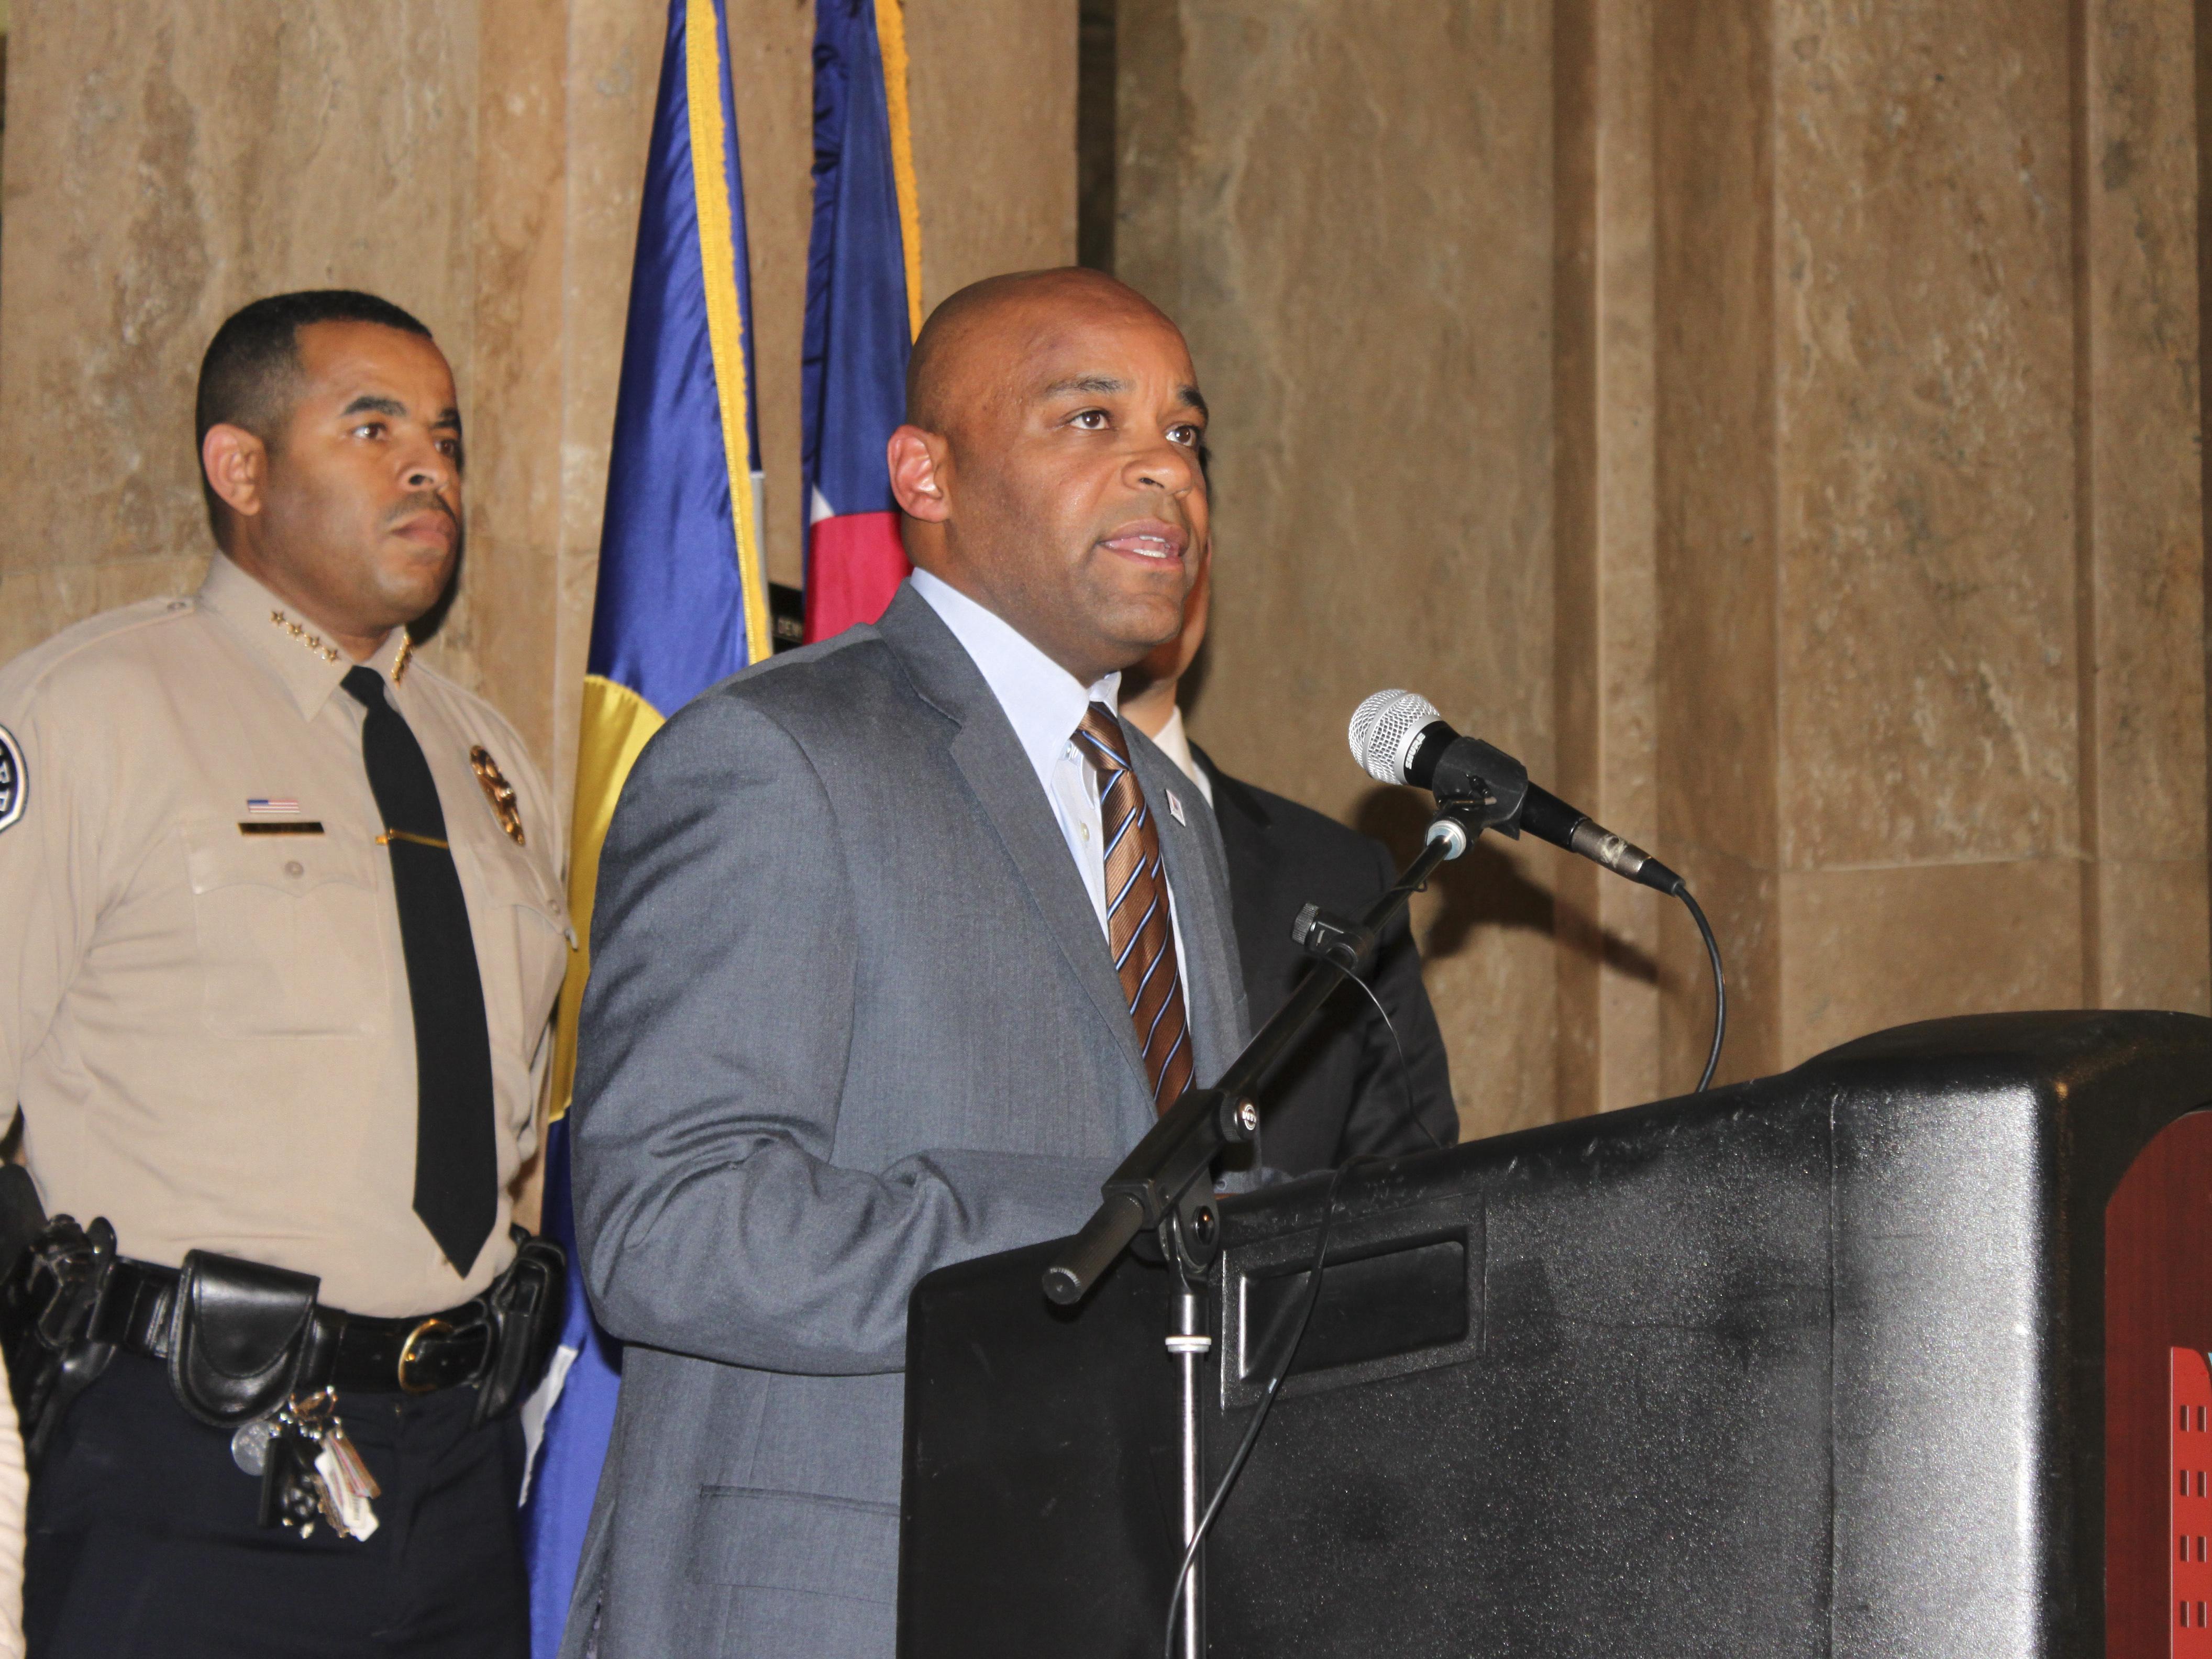 Photo: Denver Mayor Michael Hancock